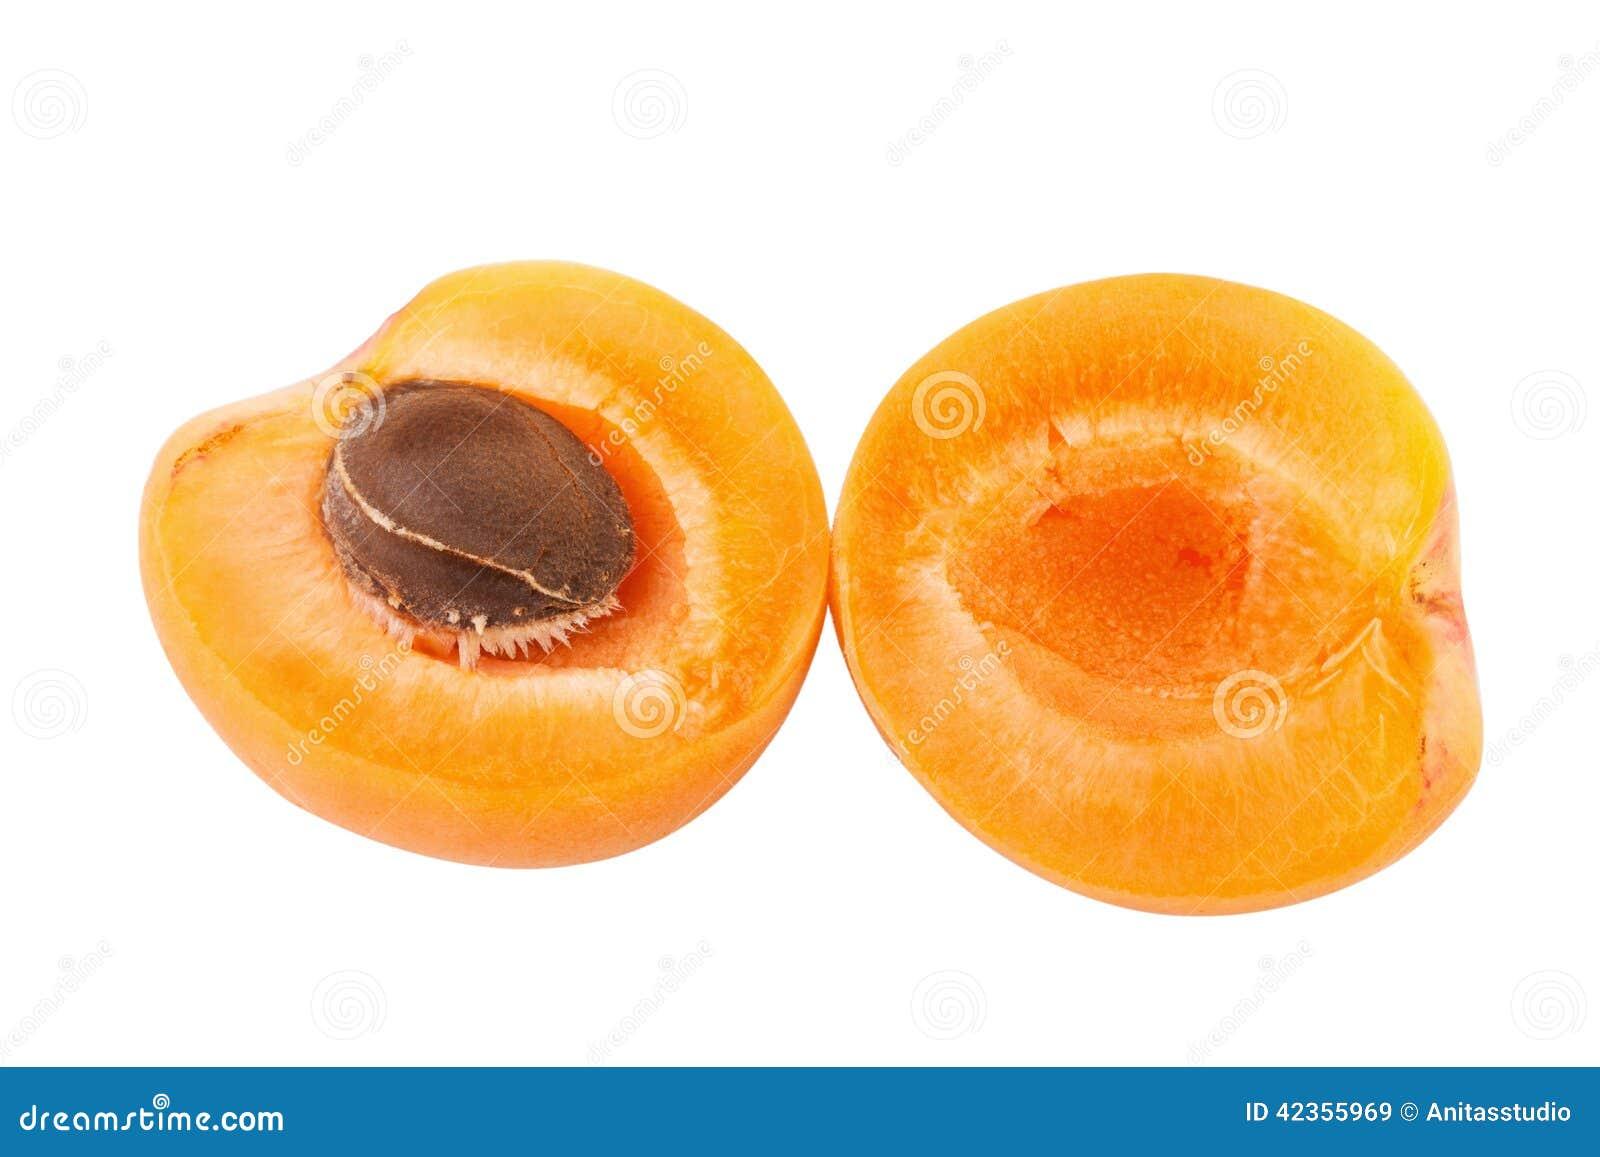 Halves of apricot